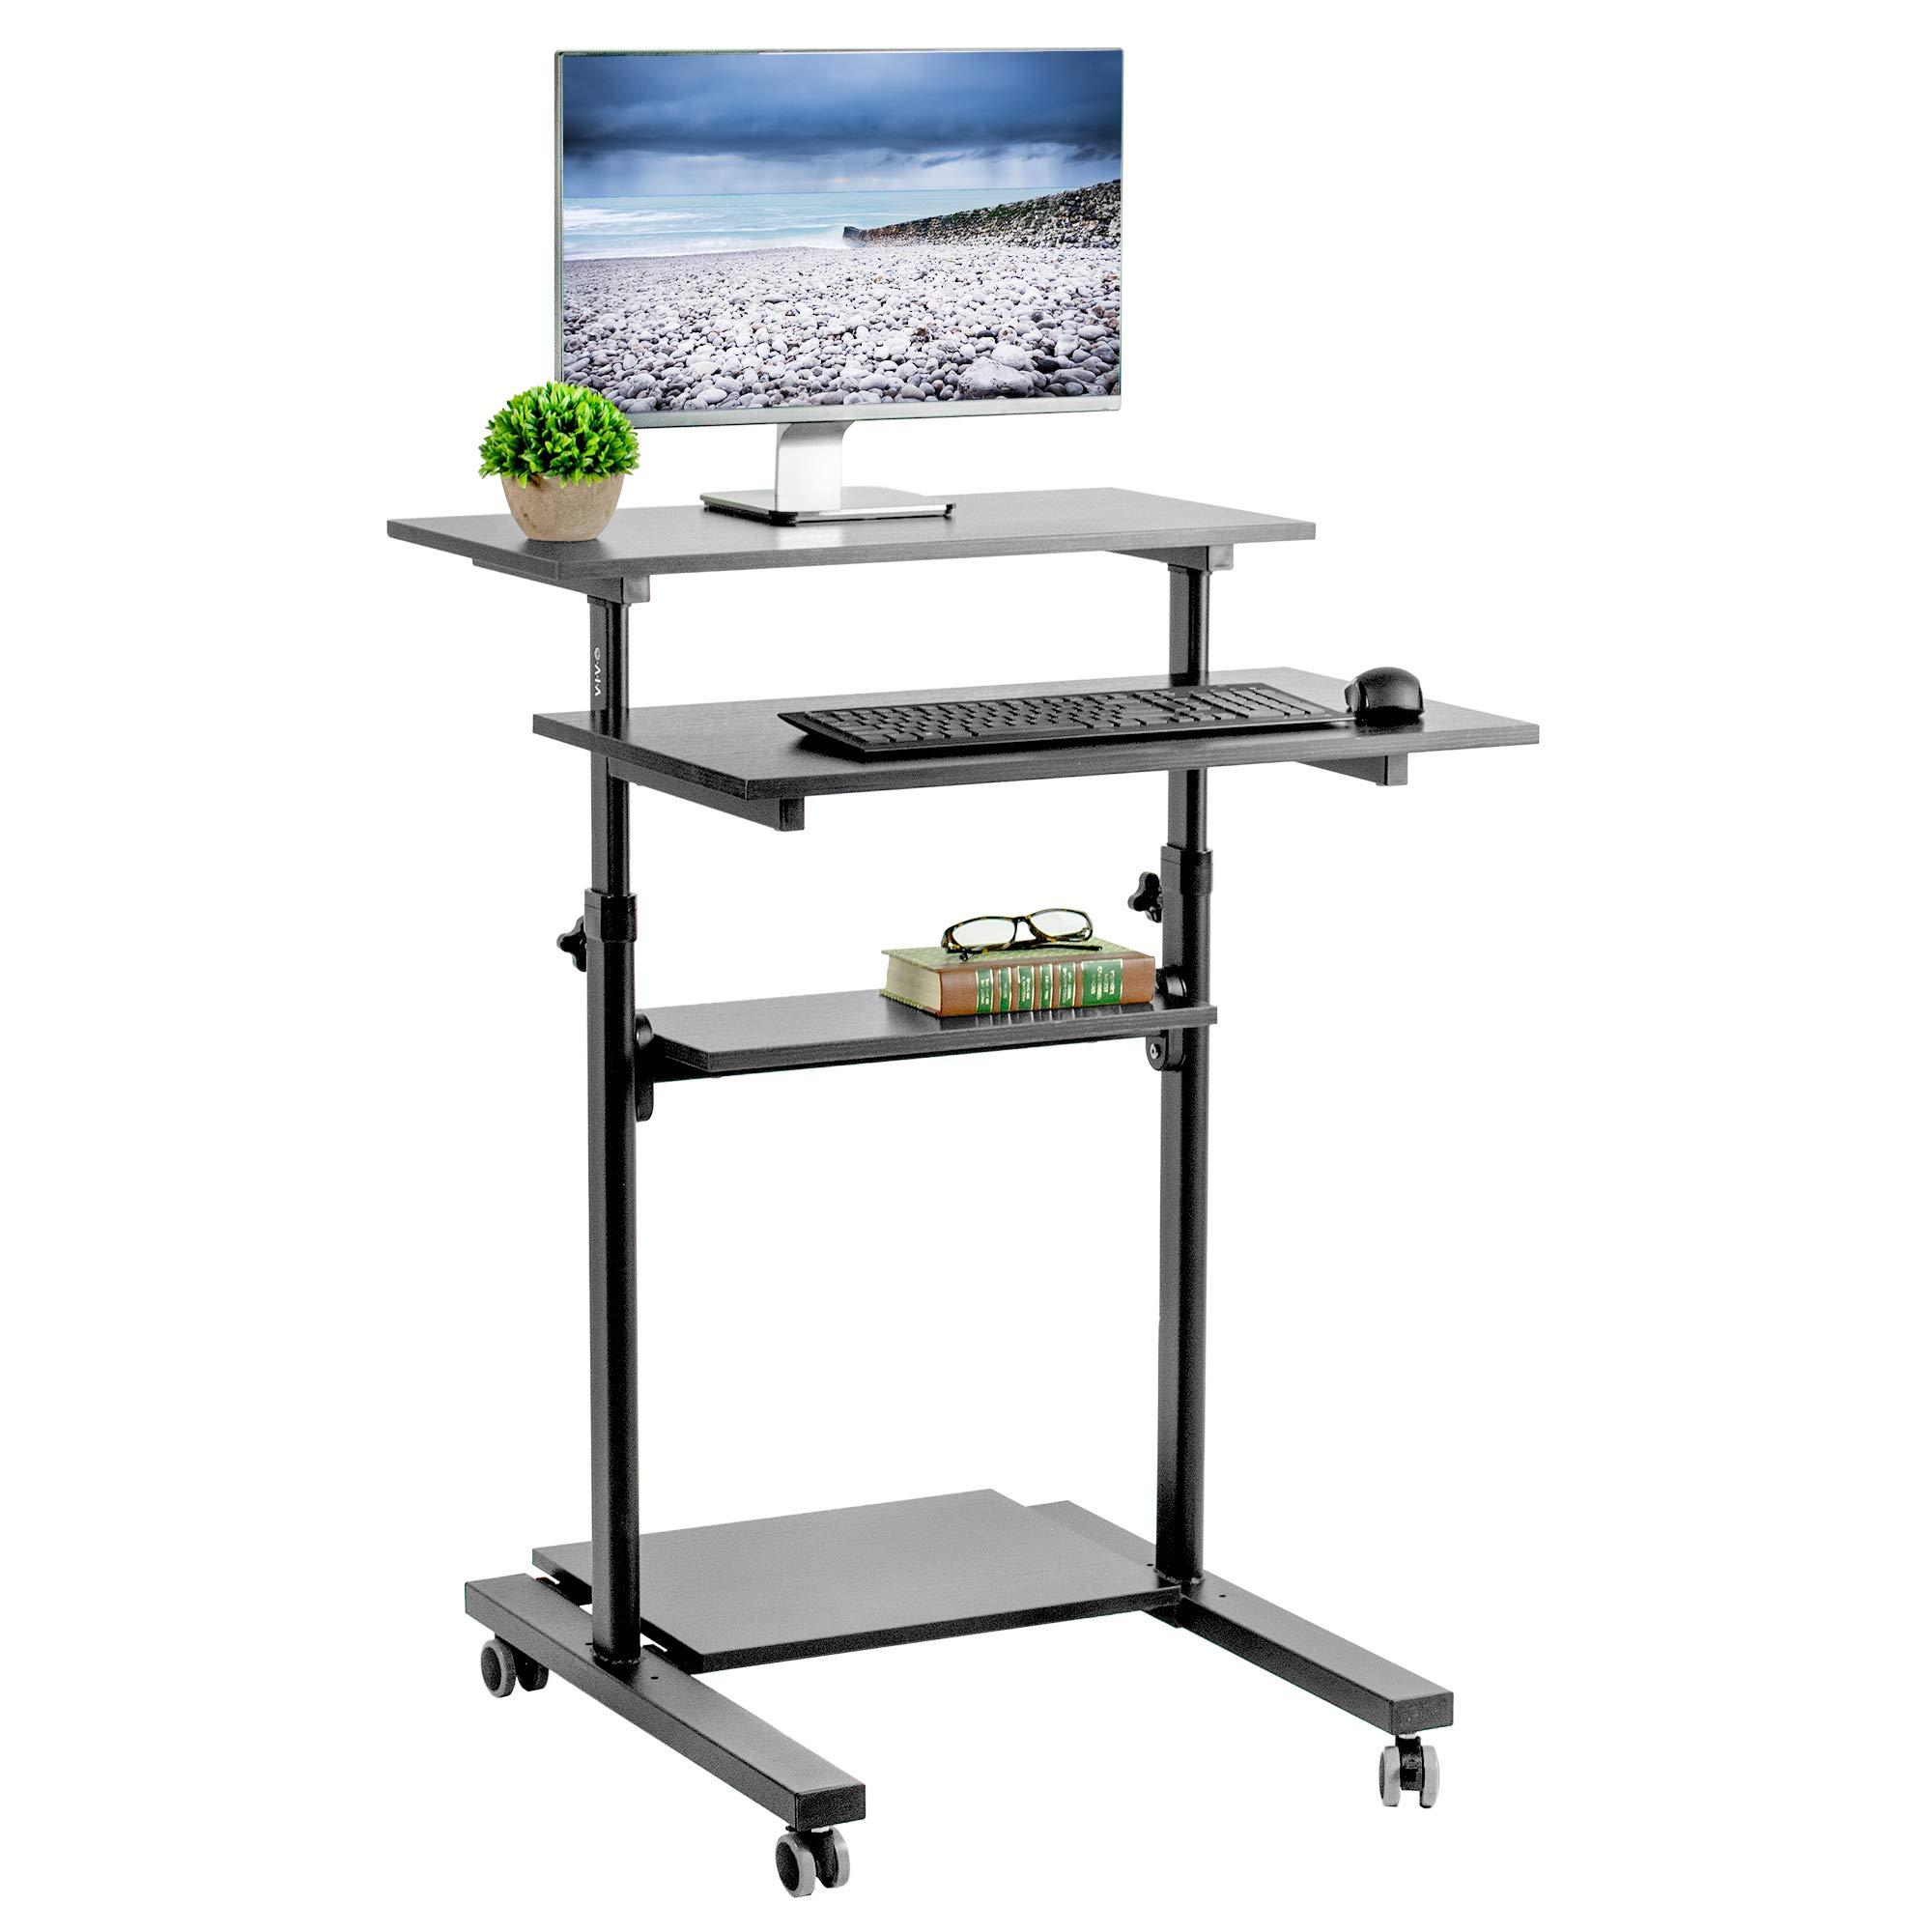 VIVO Black Mobile Height Adjustable Table Stand Up Desk with Storage, Computer Workstation Rolling Presentation Cart (CART-V02DB) by VIVO